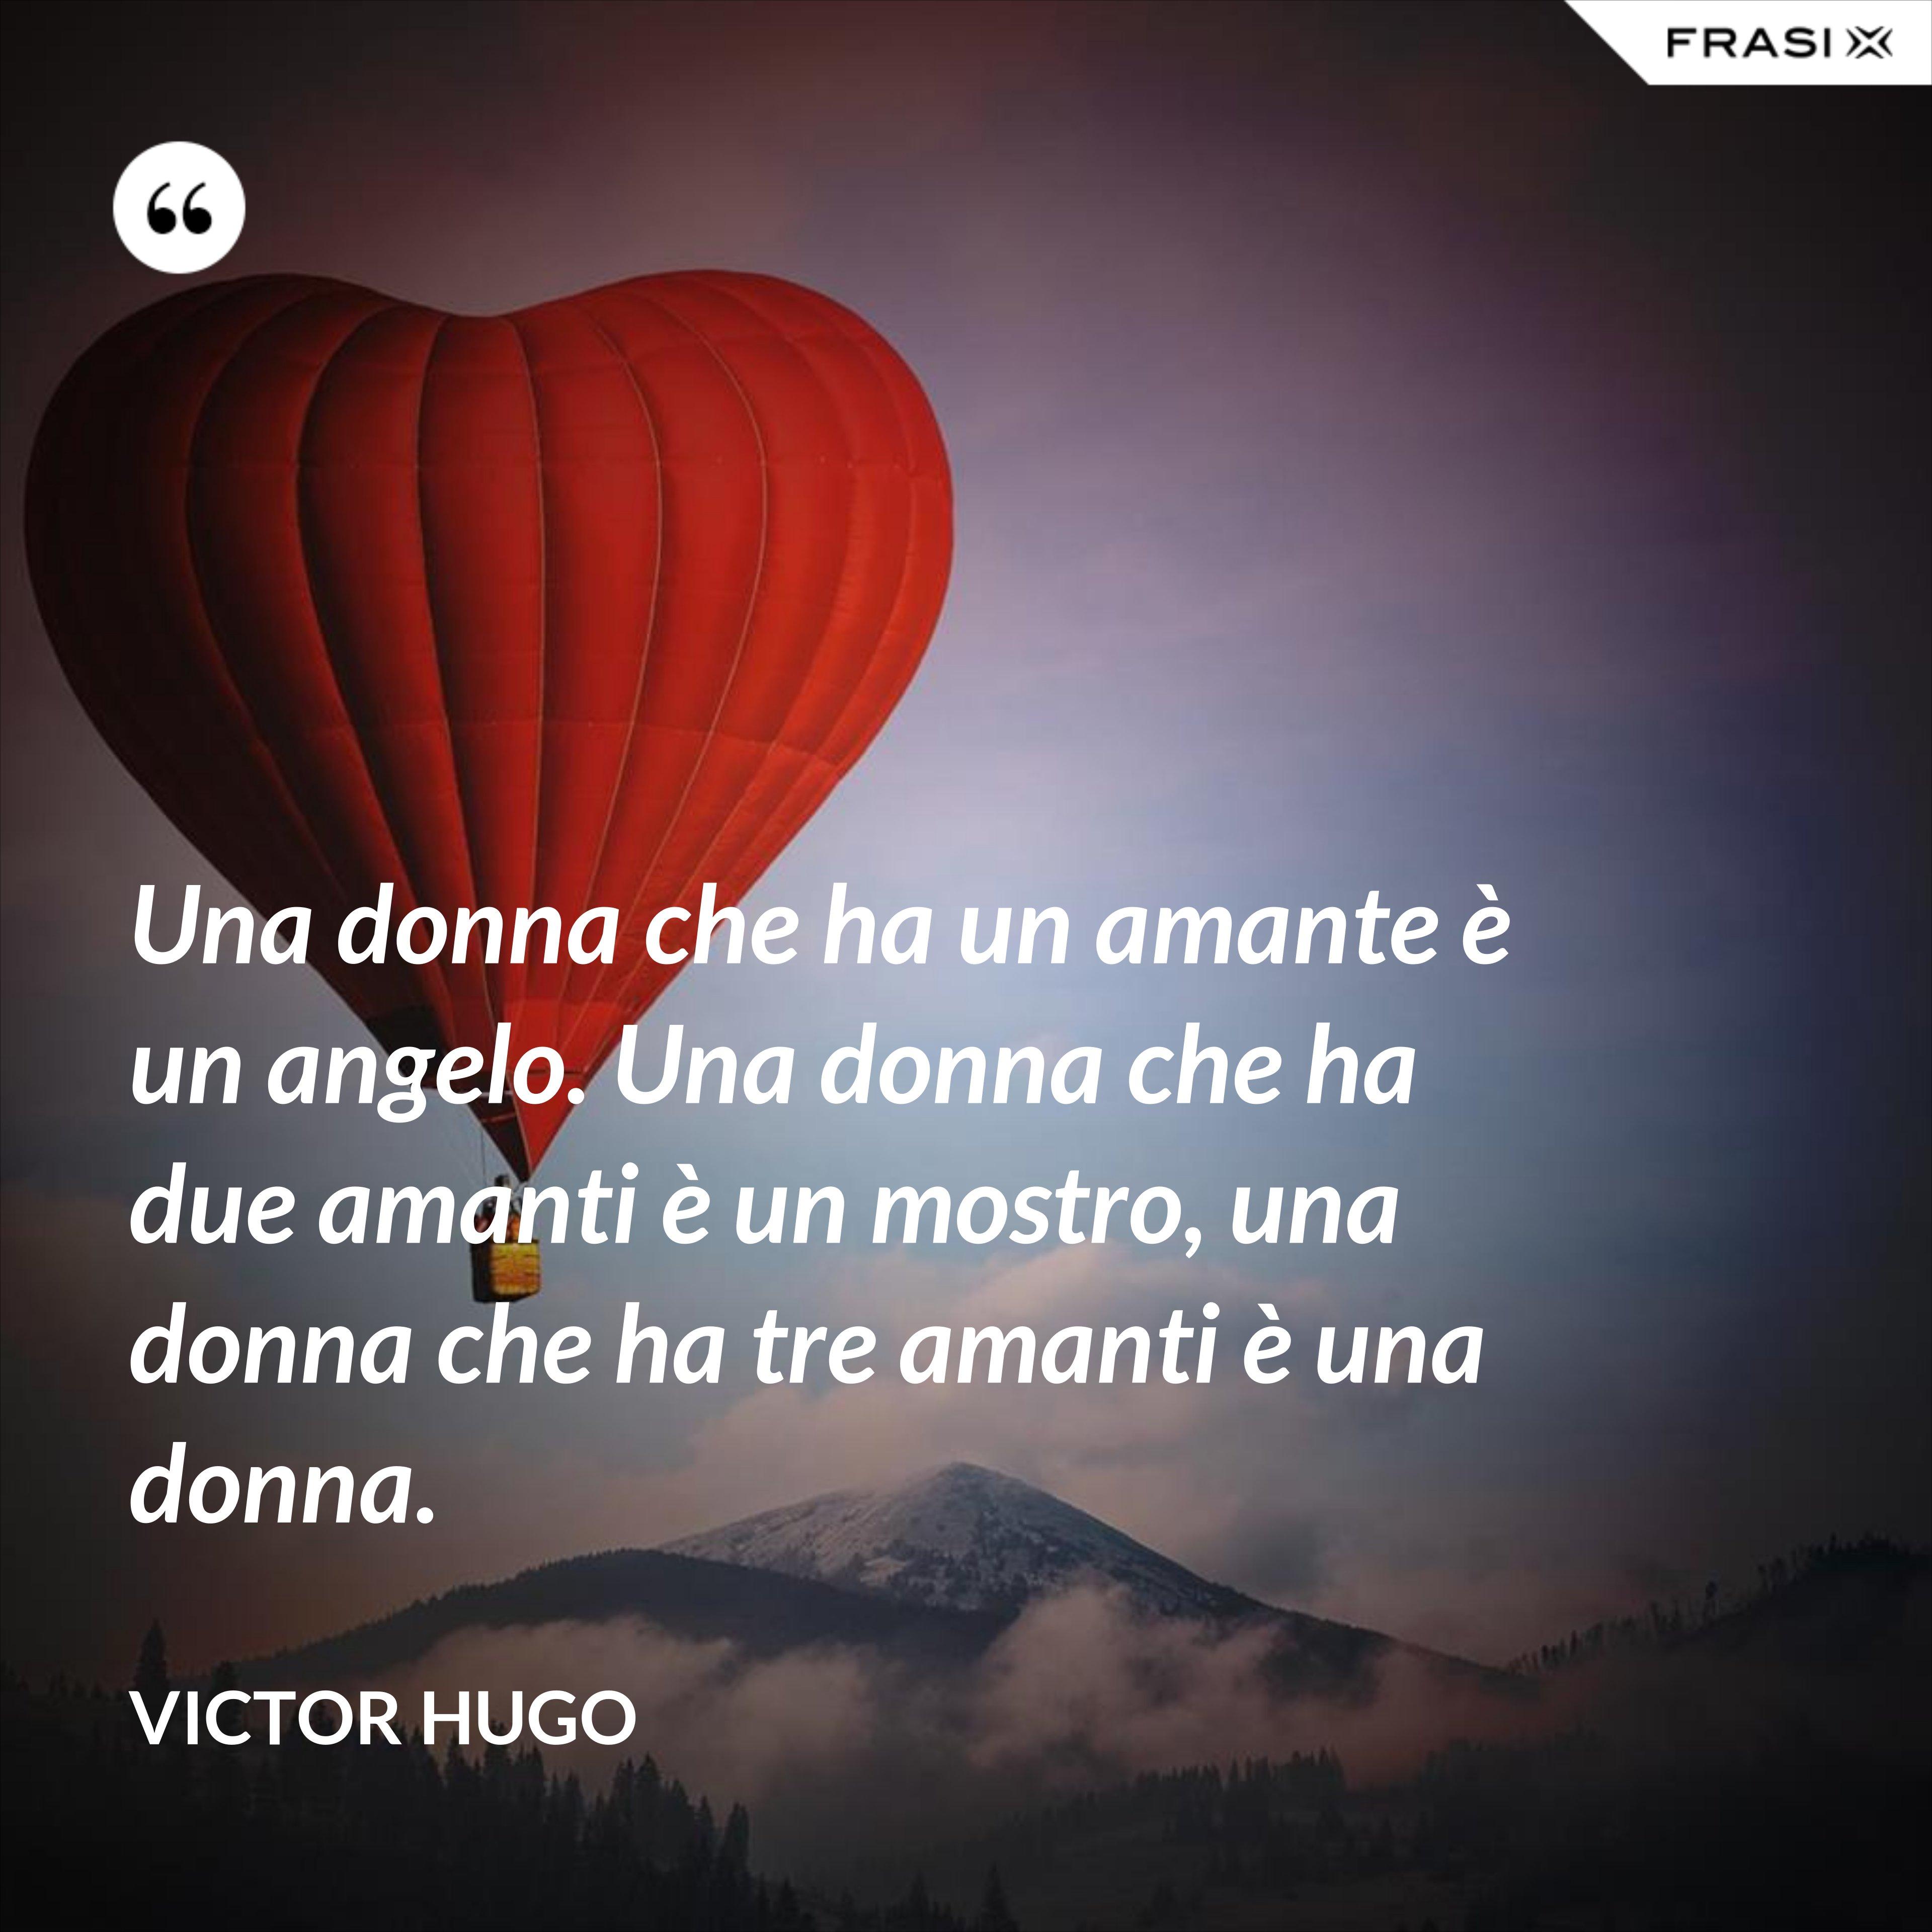 Una donna che ha un amante è un angelo. Una donna che ha due amanti è un mostro, una donna che ha tre amanti è una donna. - Victor Hugo